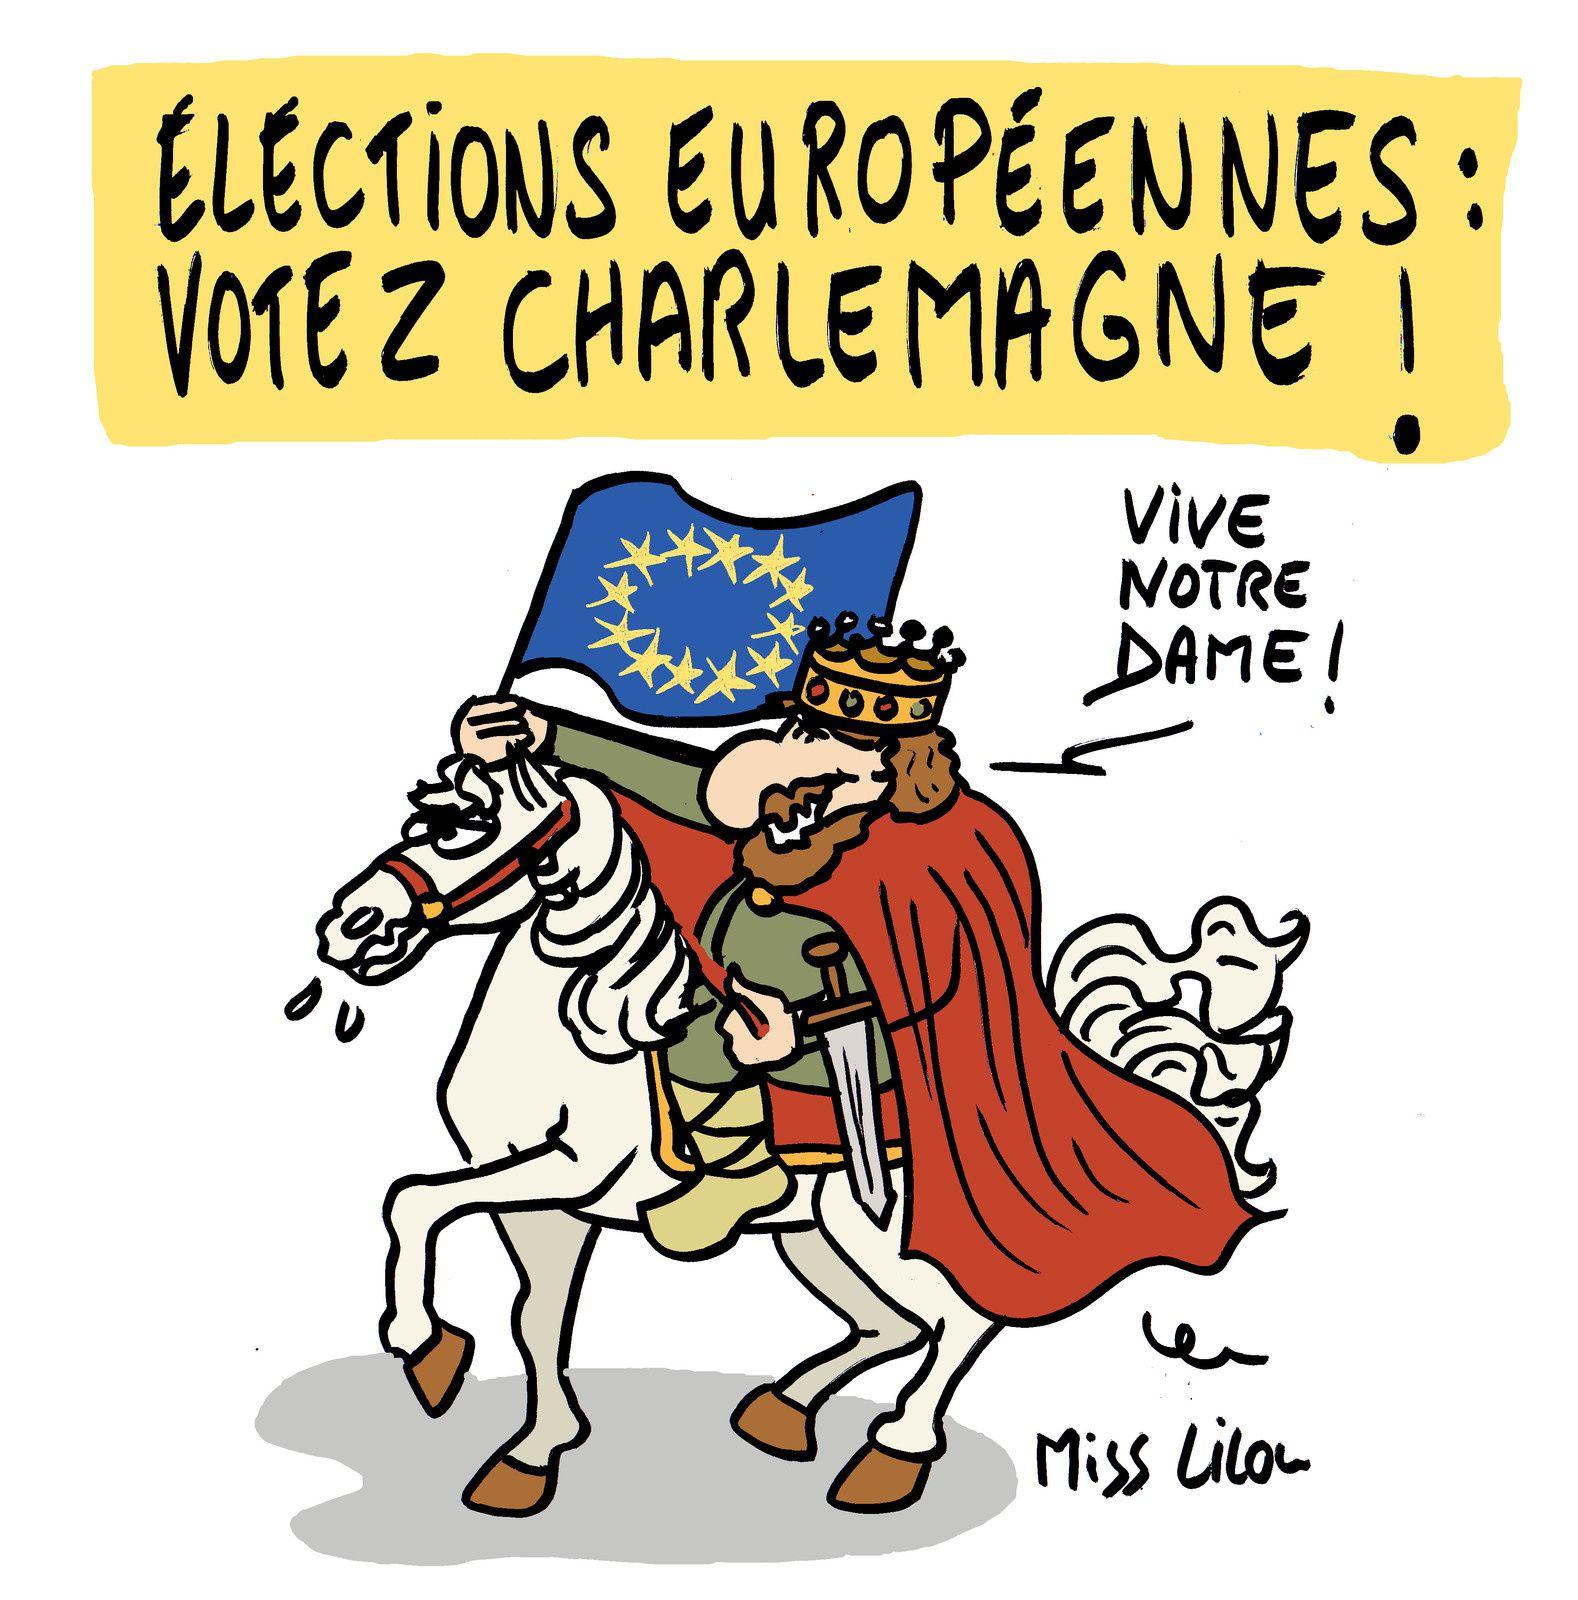 Elections européennes : Votez Charlemagne !